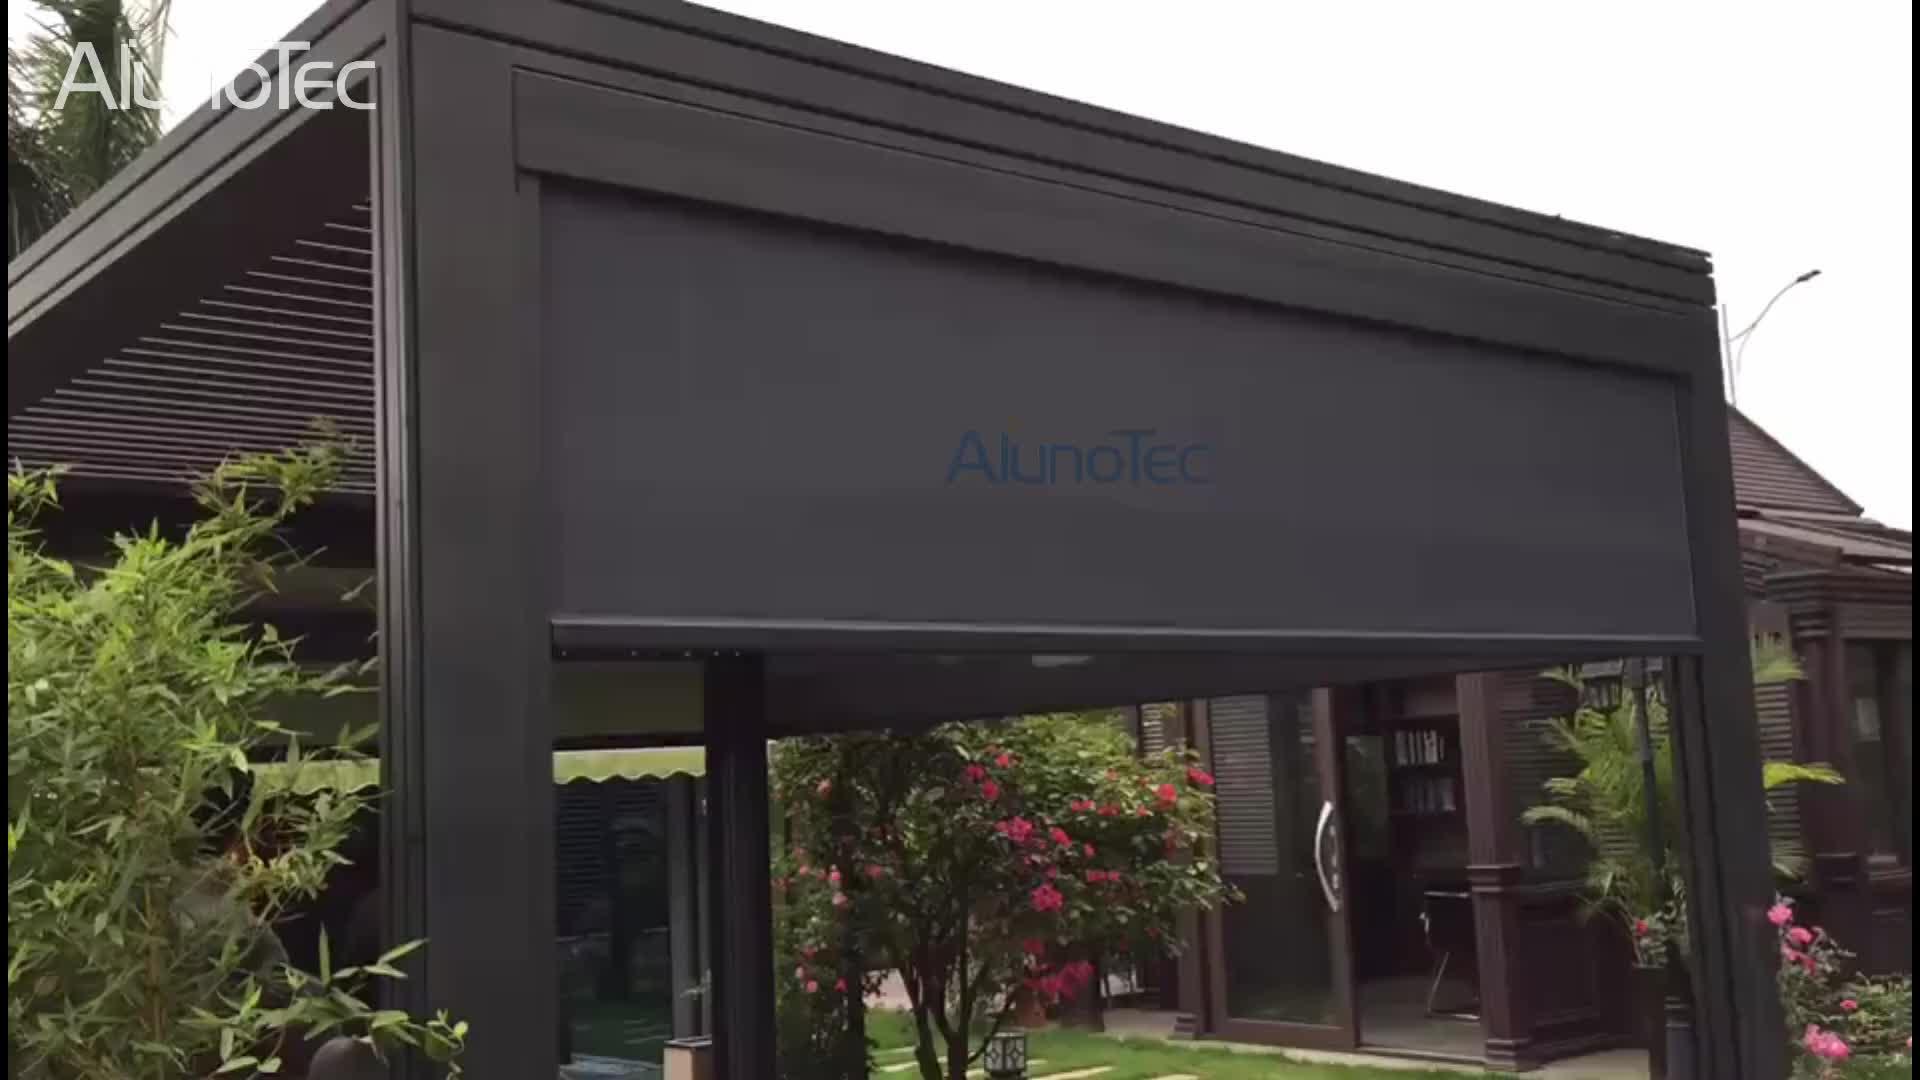 Motorized Outdoor Garden Shade Shutter Roller Zip Screen Blinds For Pergola